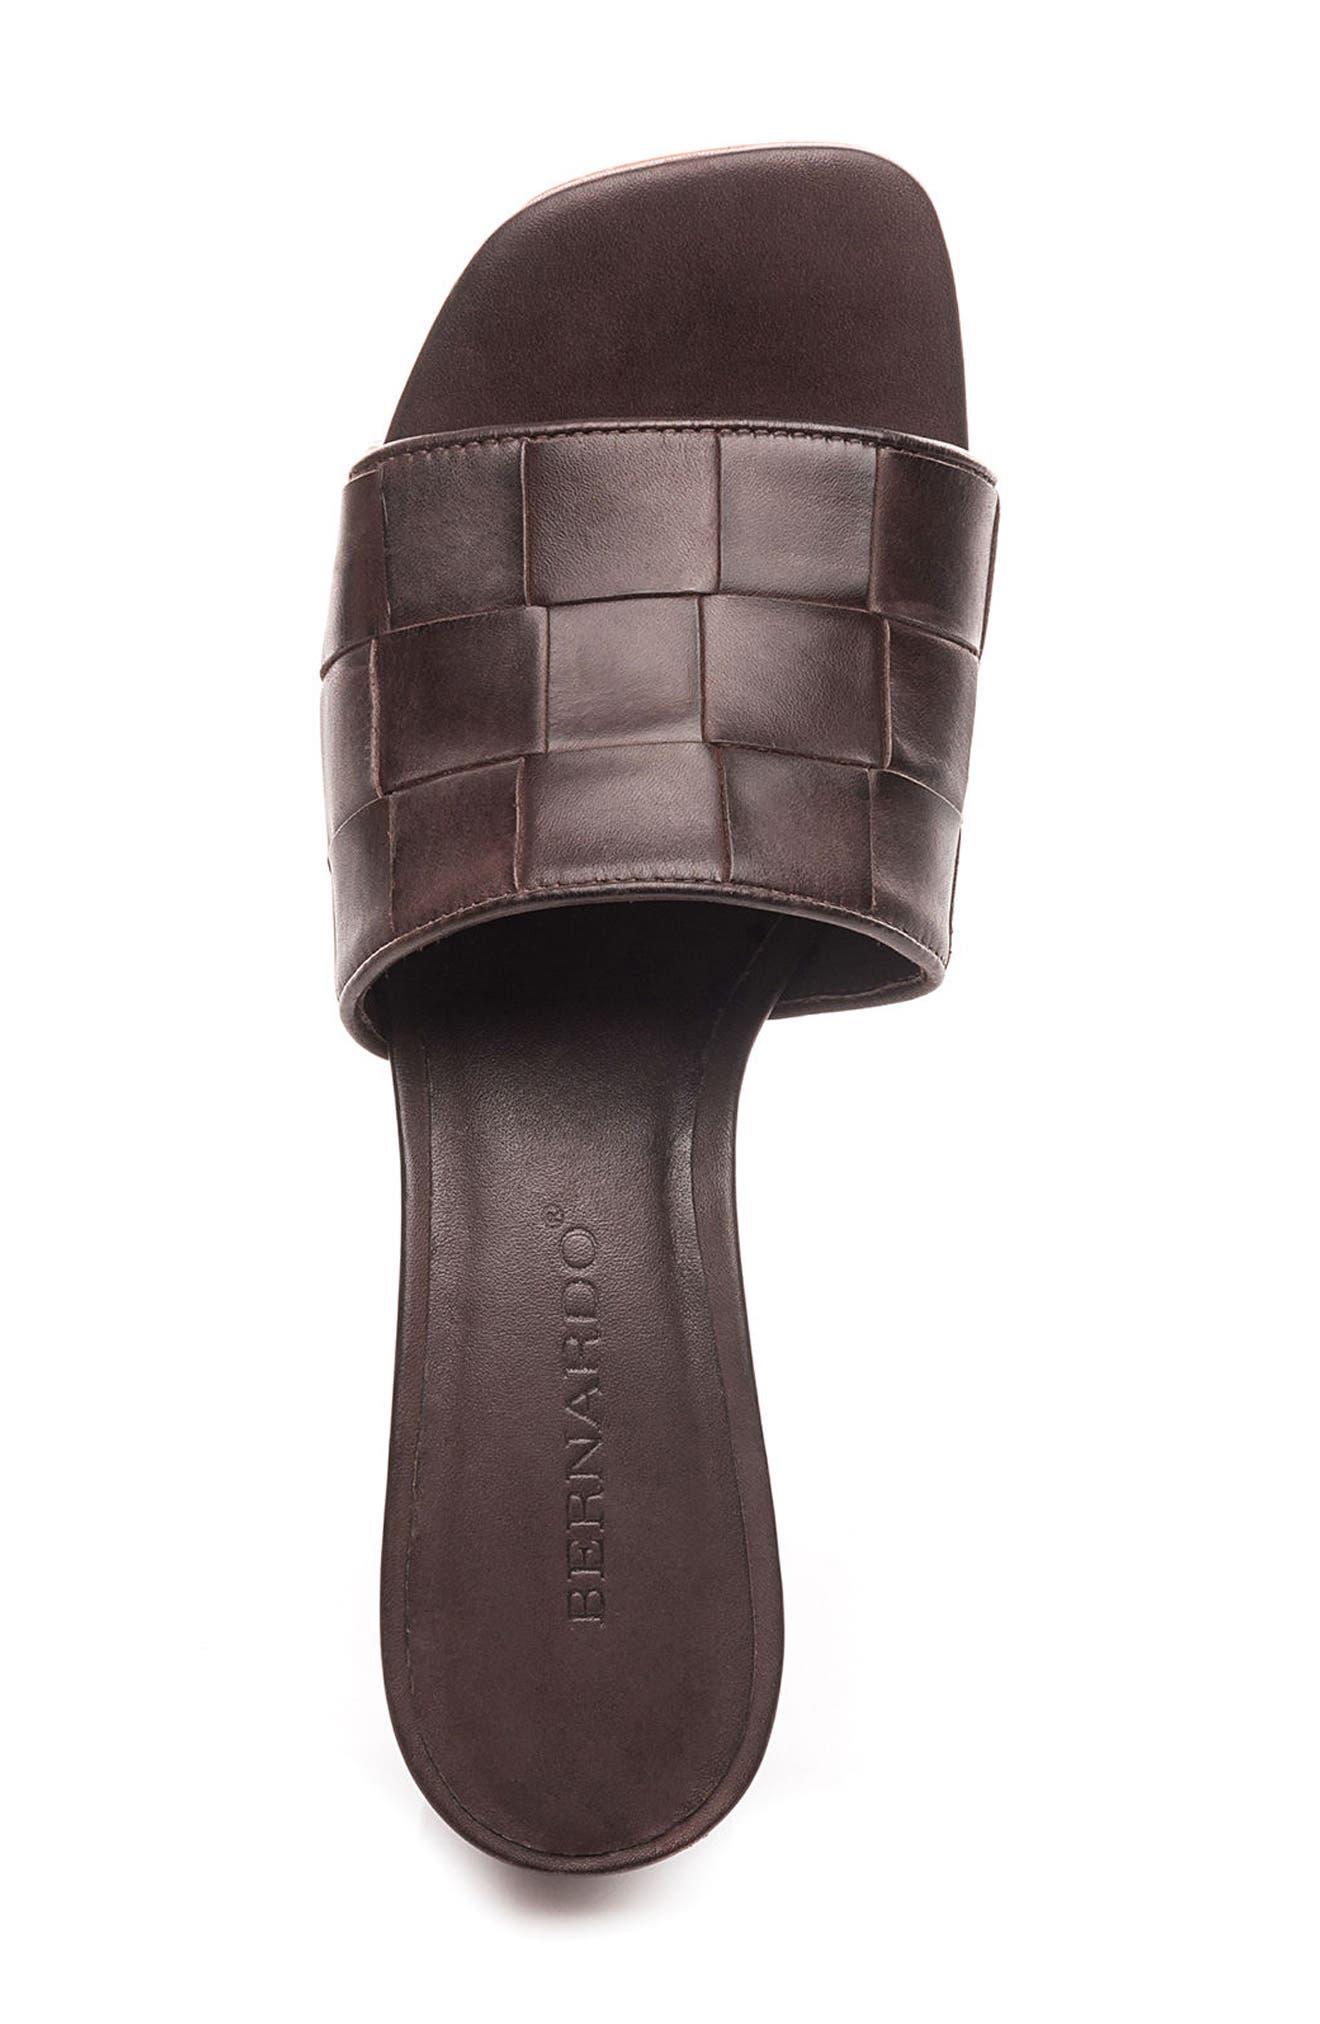 Bernardo Bridget Block Heel Sandal,                             Alternate thumbnail 19, color,